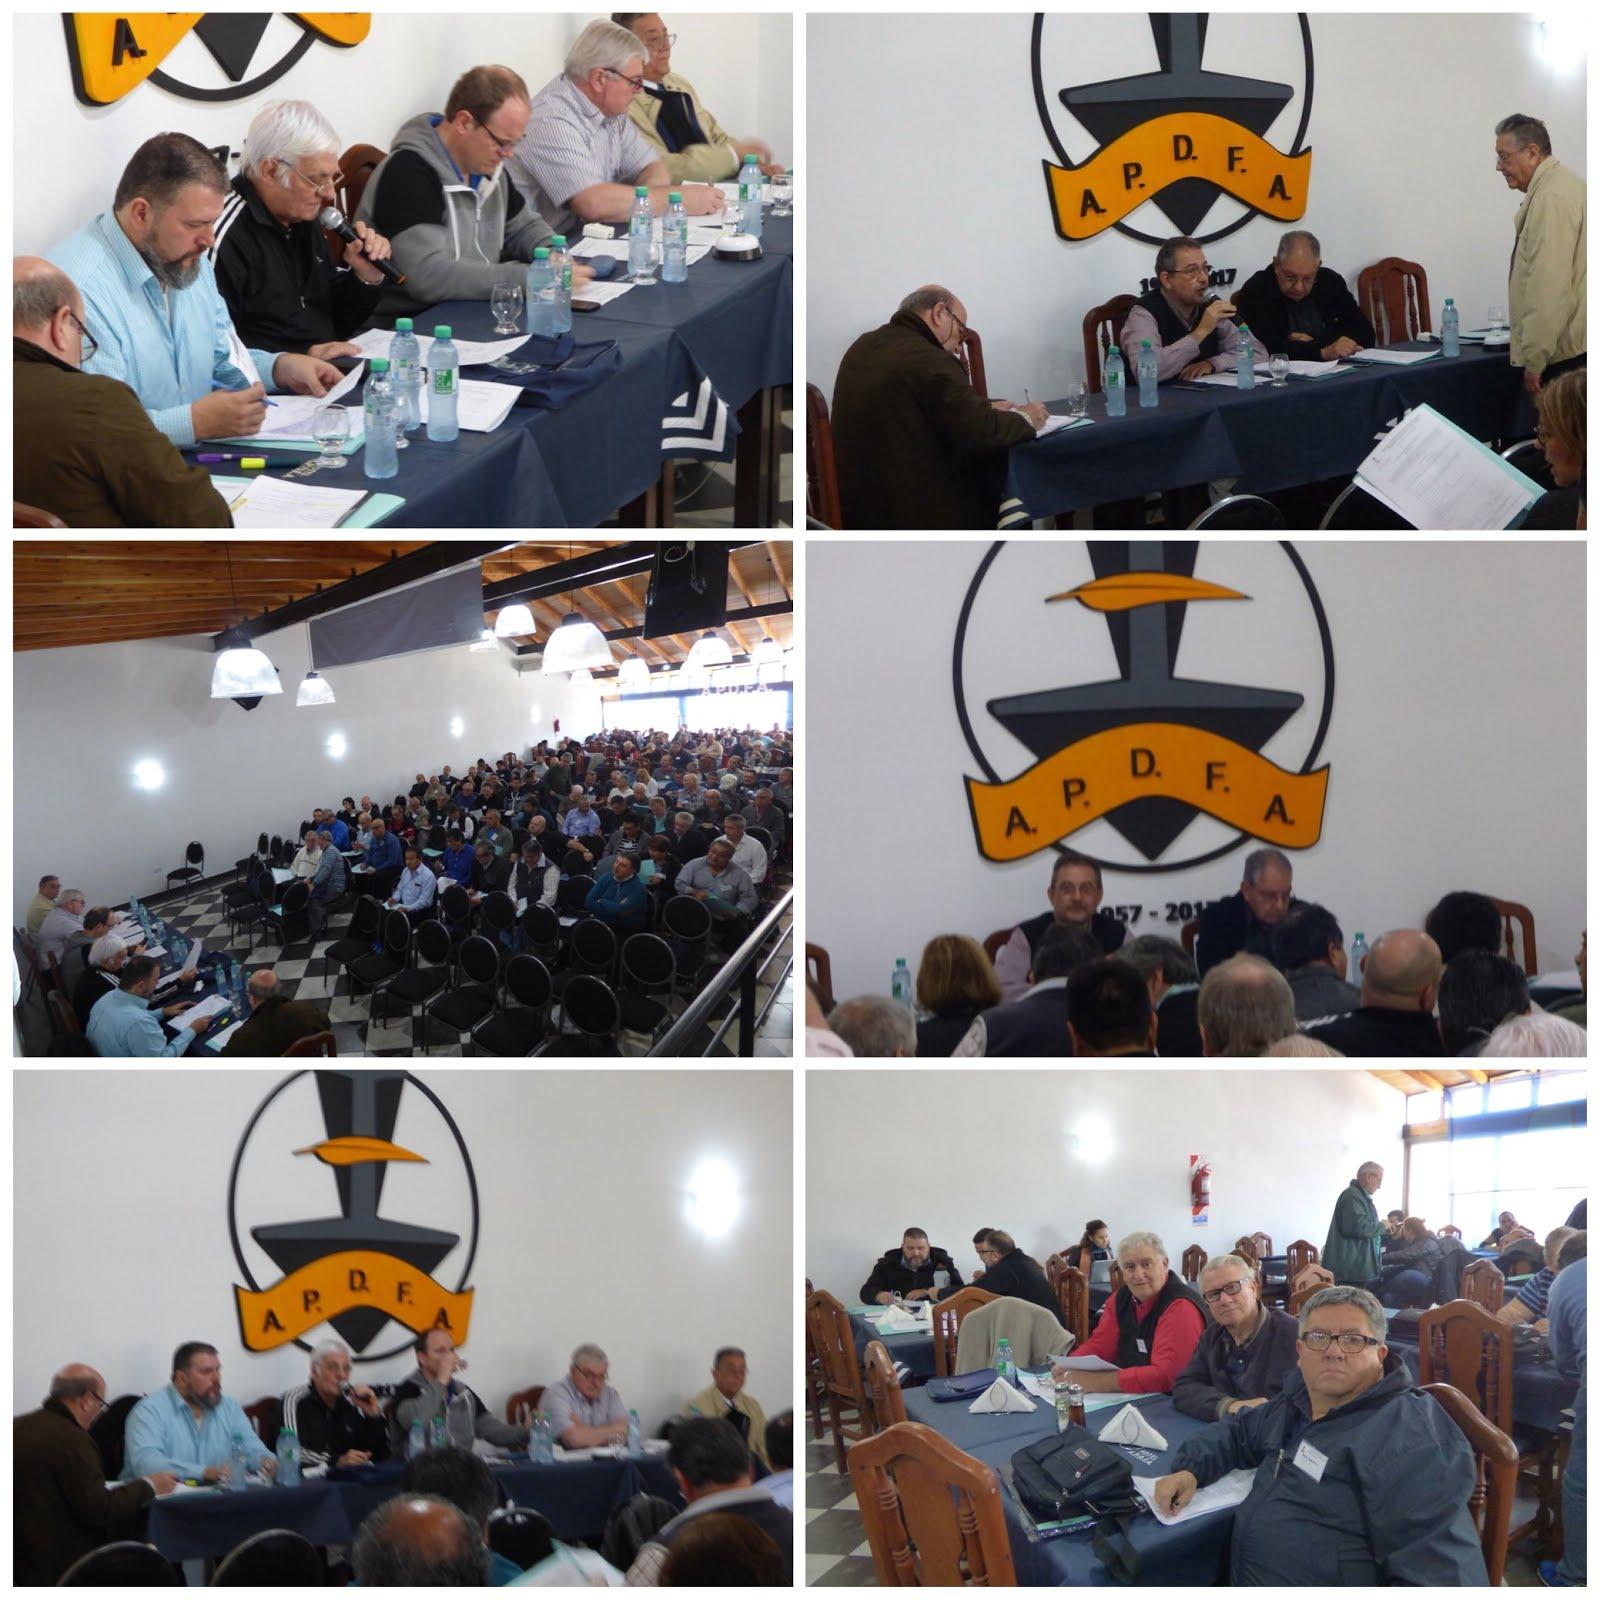 Congreso año 2017 - Cordoba, Argentina.